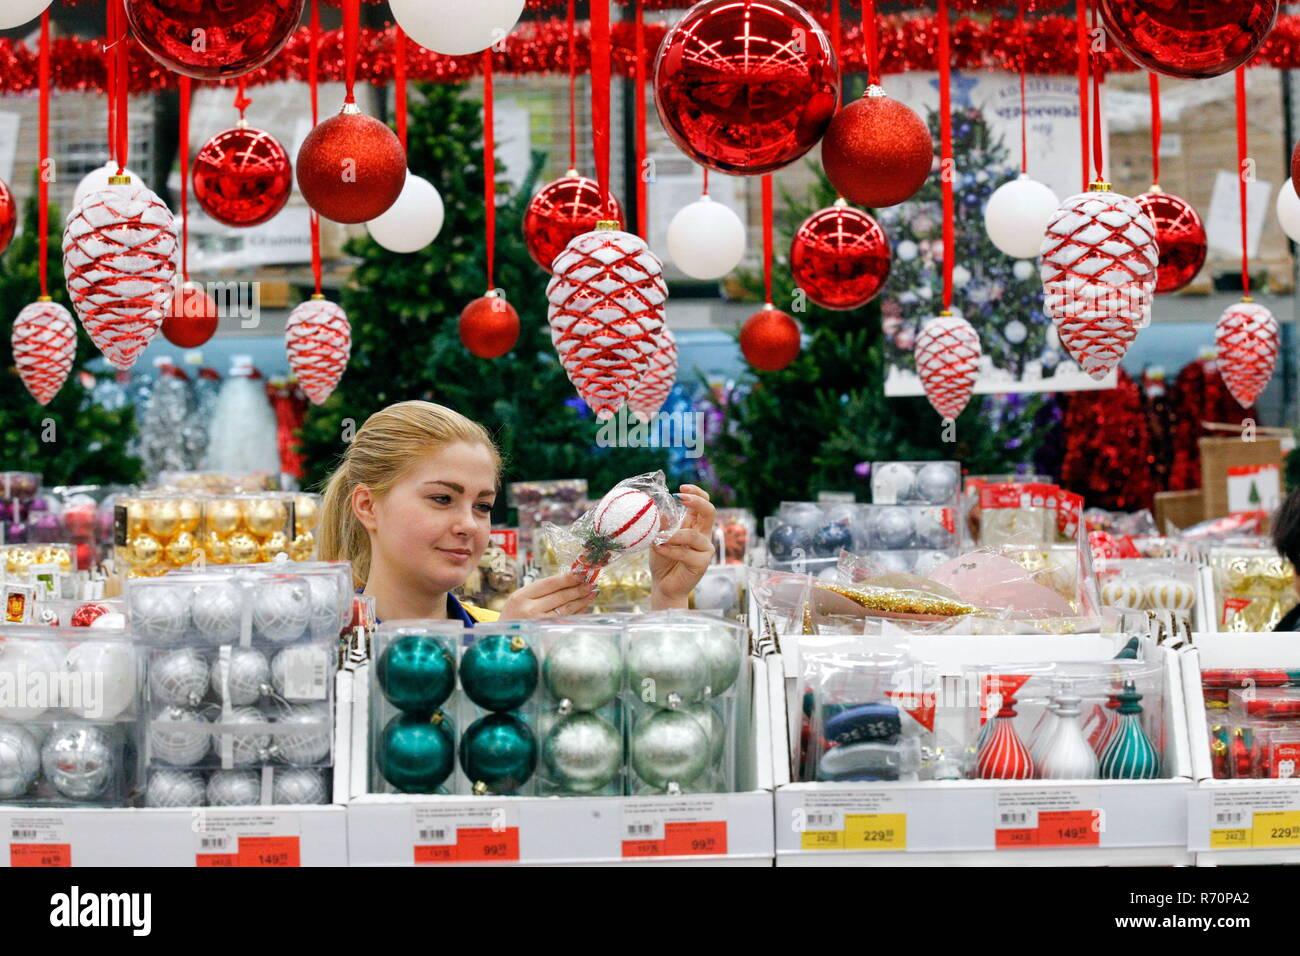 Selling Christmas decoration at a Lenta supermarket. Valery Matytsin/TASS Credit: ITAR-TASS News Agency/Alamy Live News - Stock Image